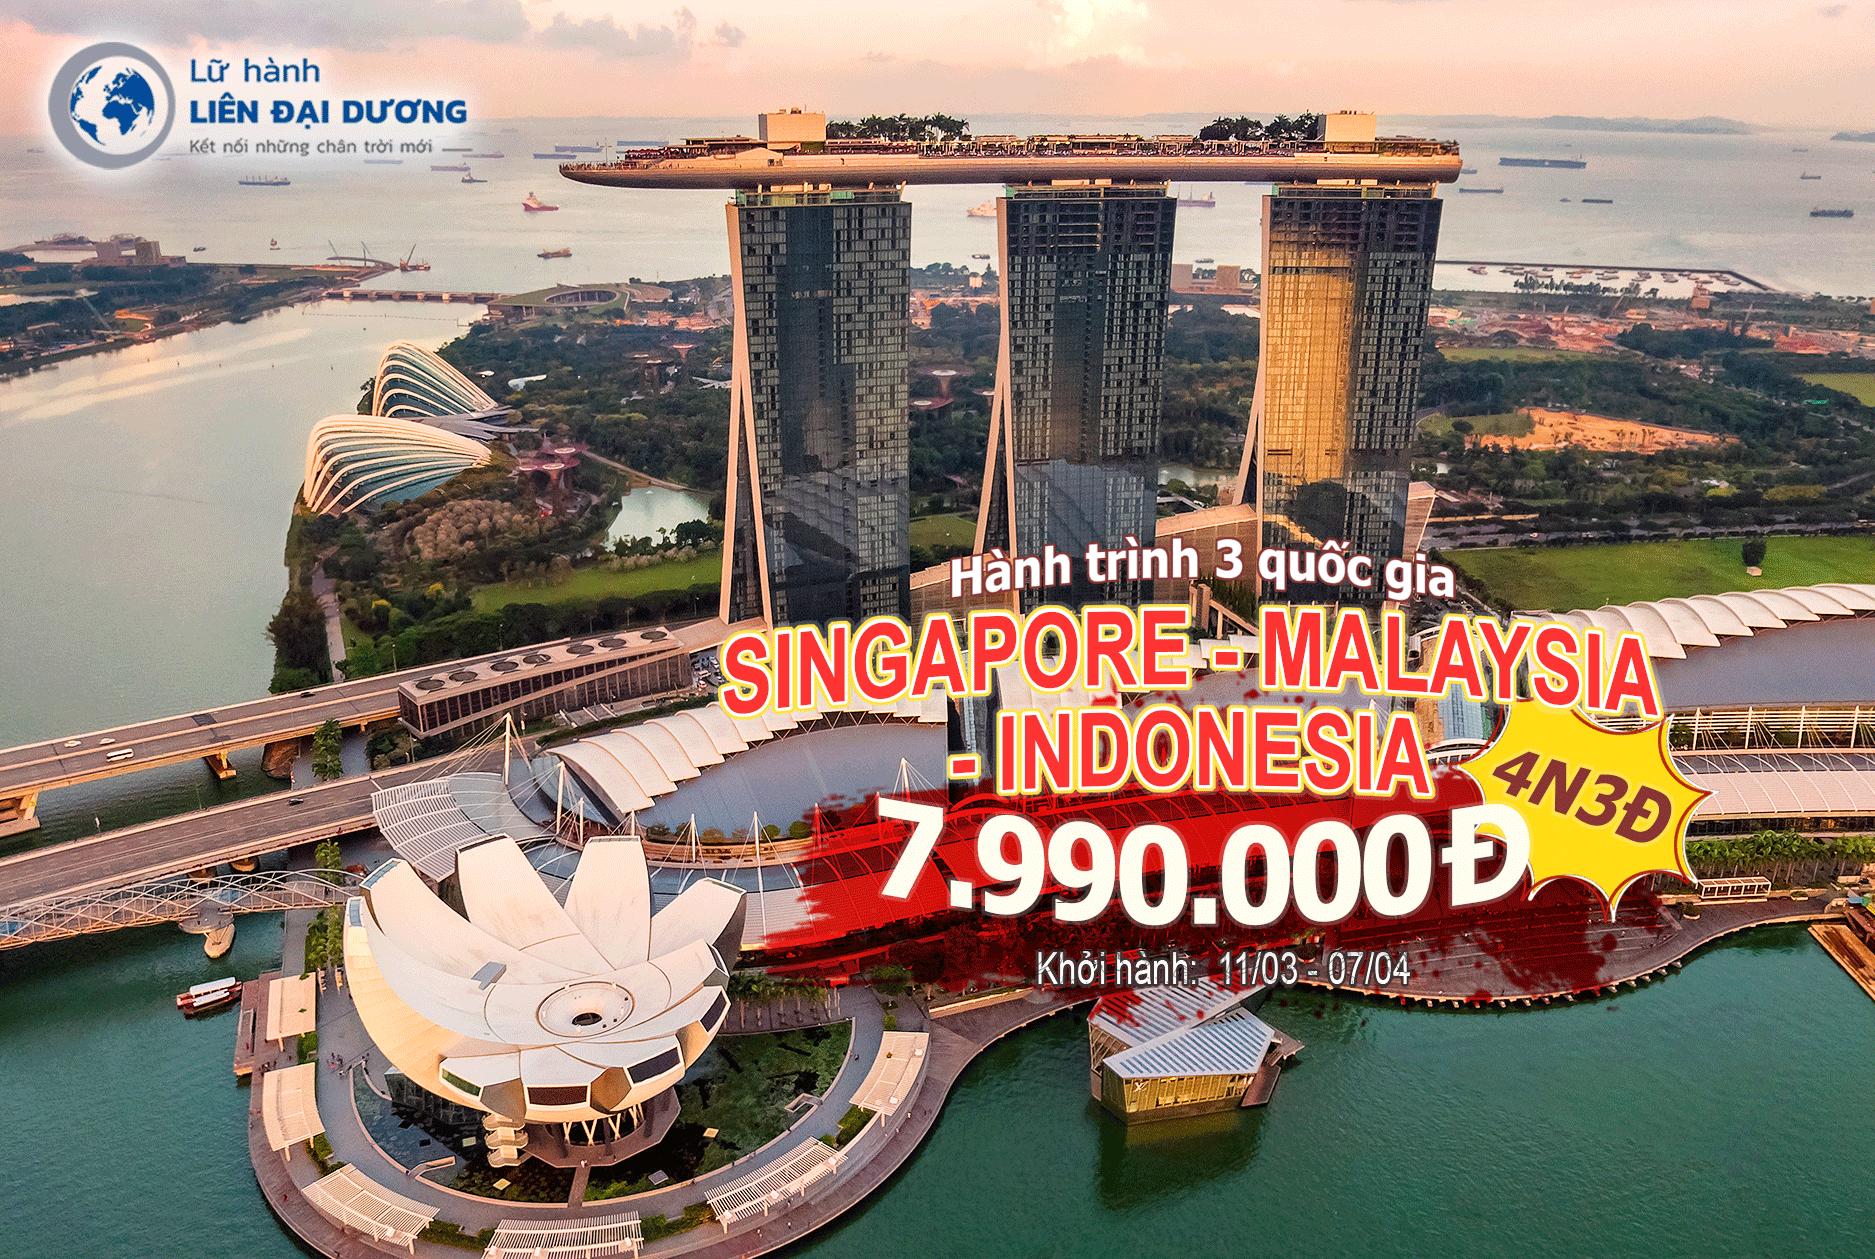 tour-singapore-malaysia-indonesia-4N3D